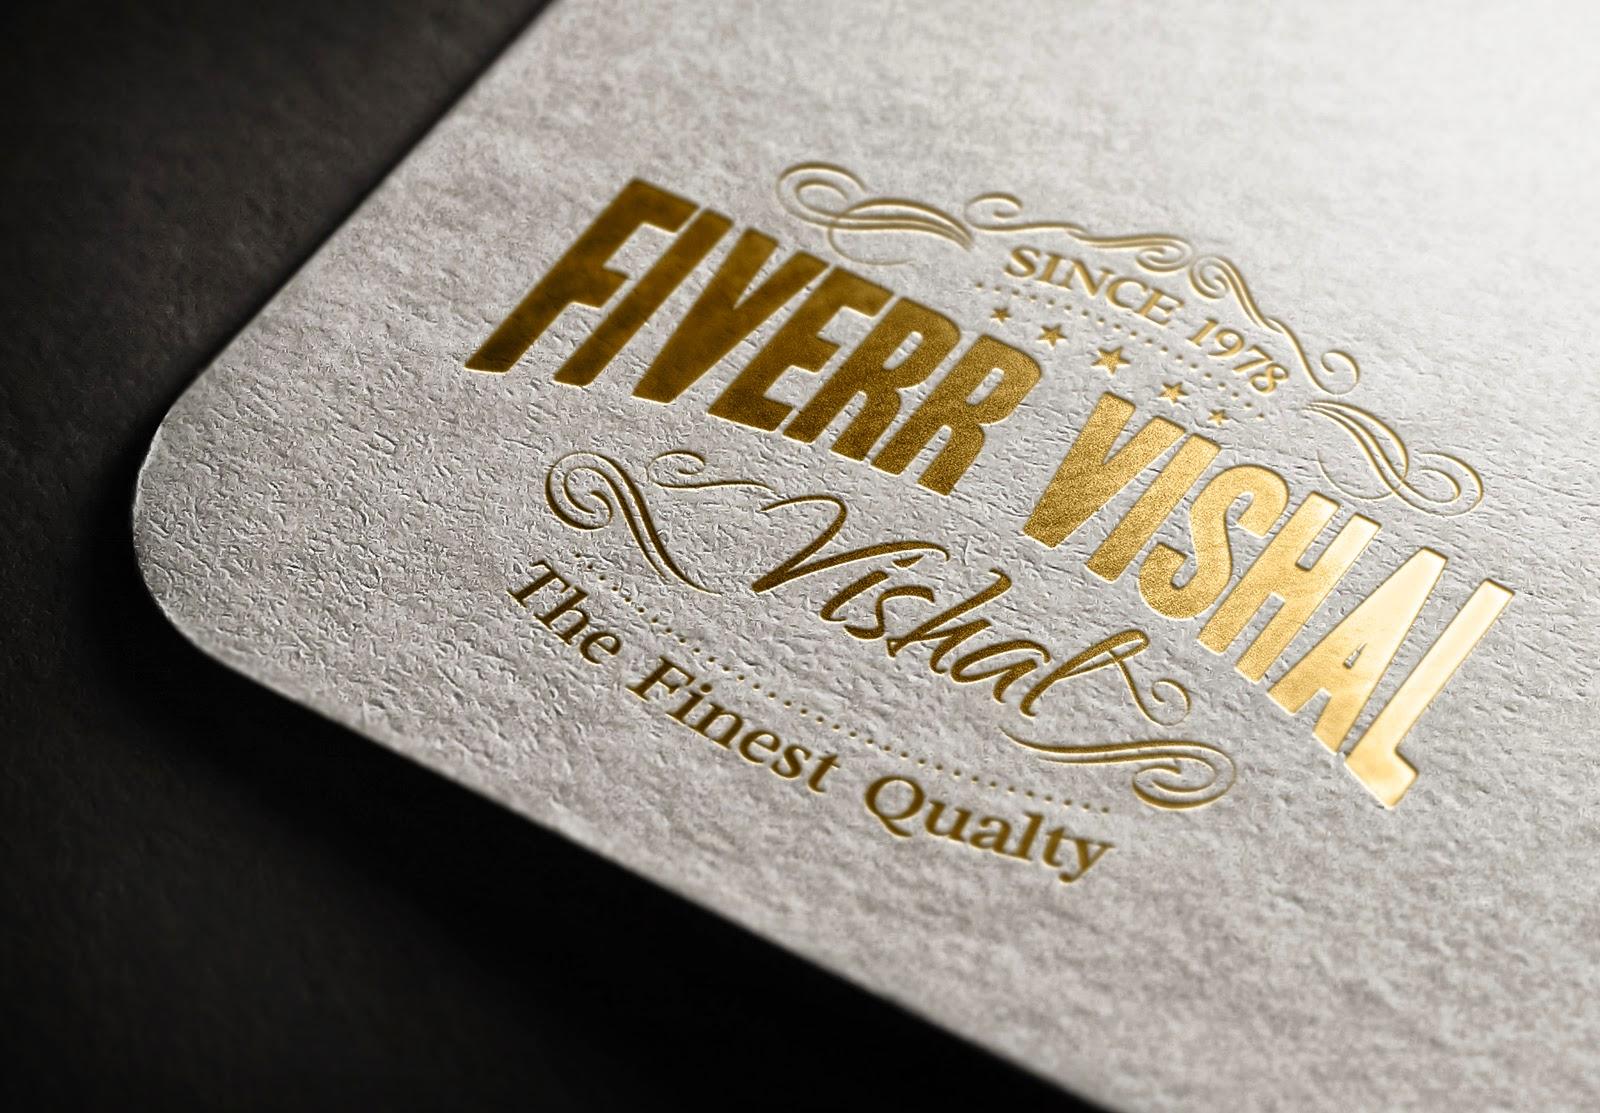 FIVERR VISHAL NEW ONE ~ FIVERR VISHAL